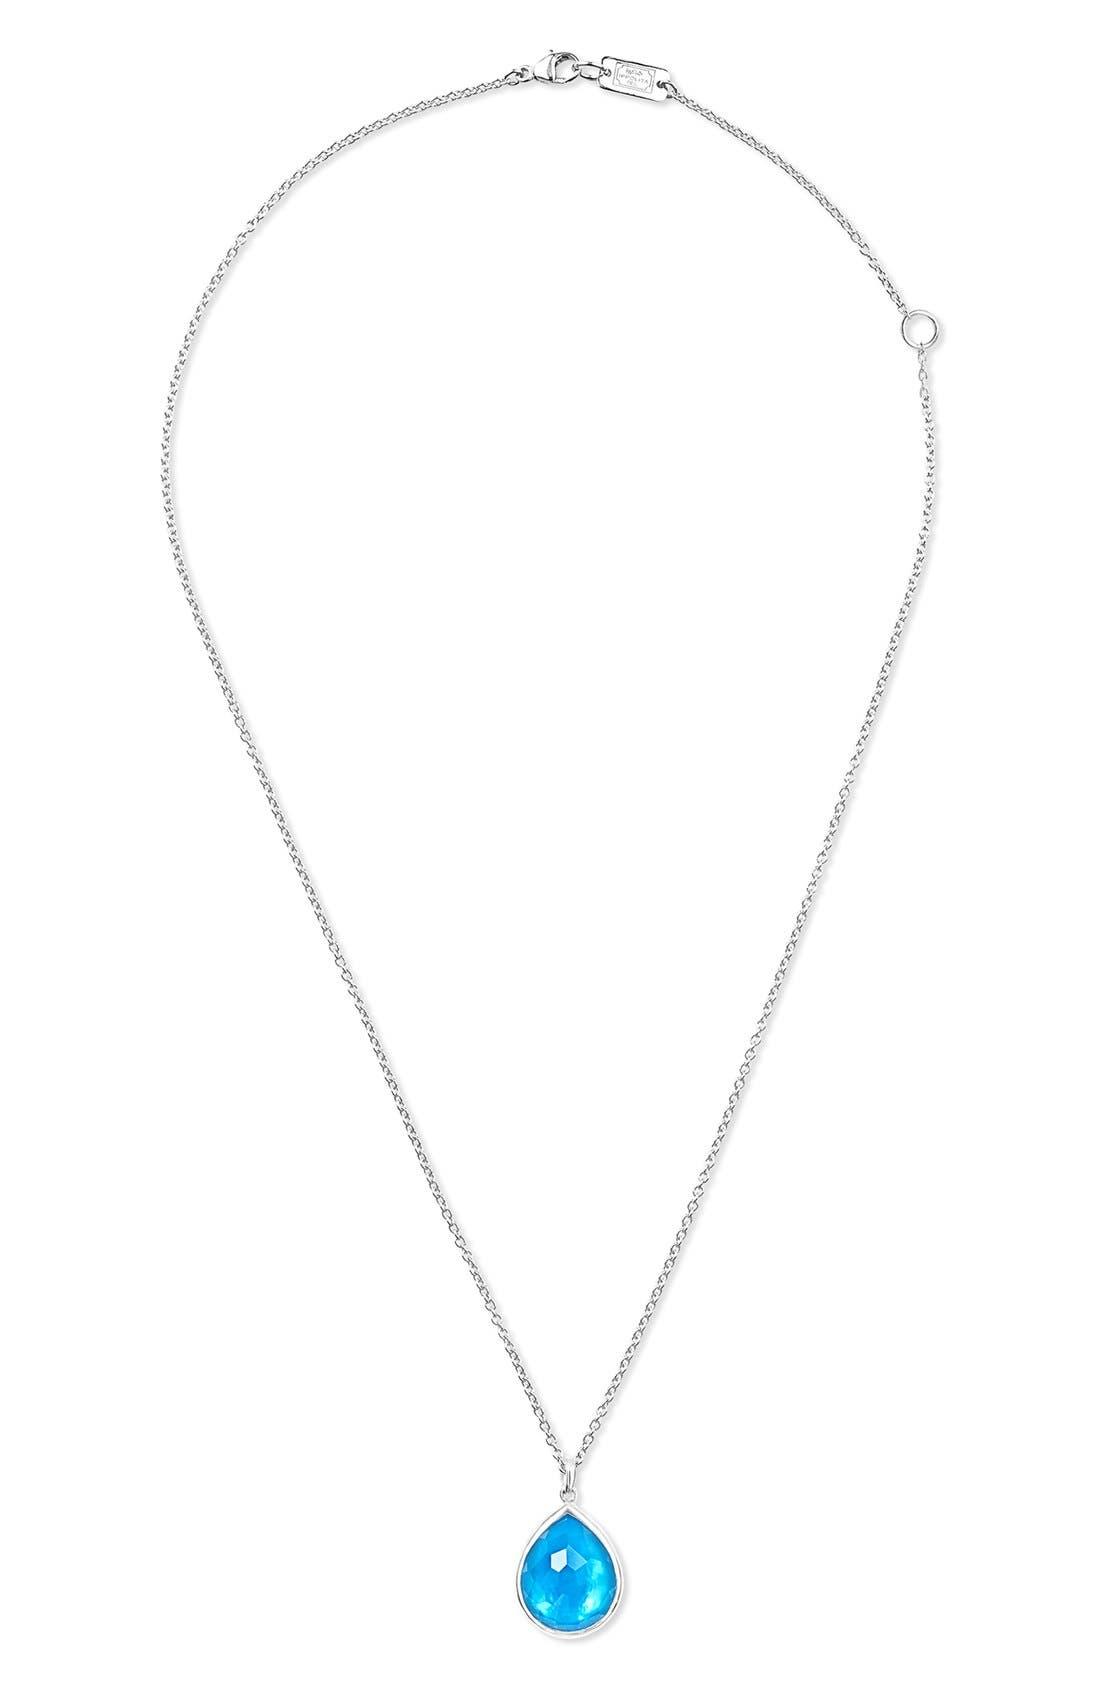 'Wonderland' Large Teardrop Pendant Necklace,                             Alternate thumbnail 3, color,                             100